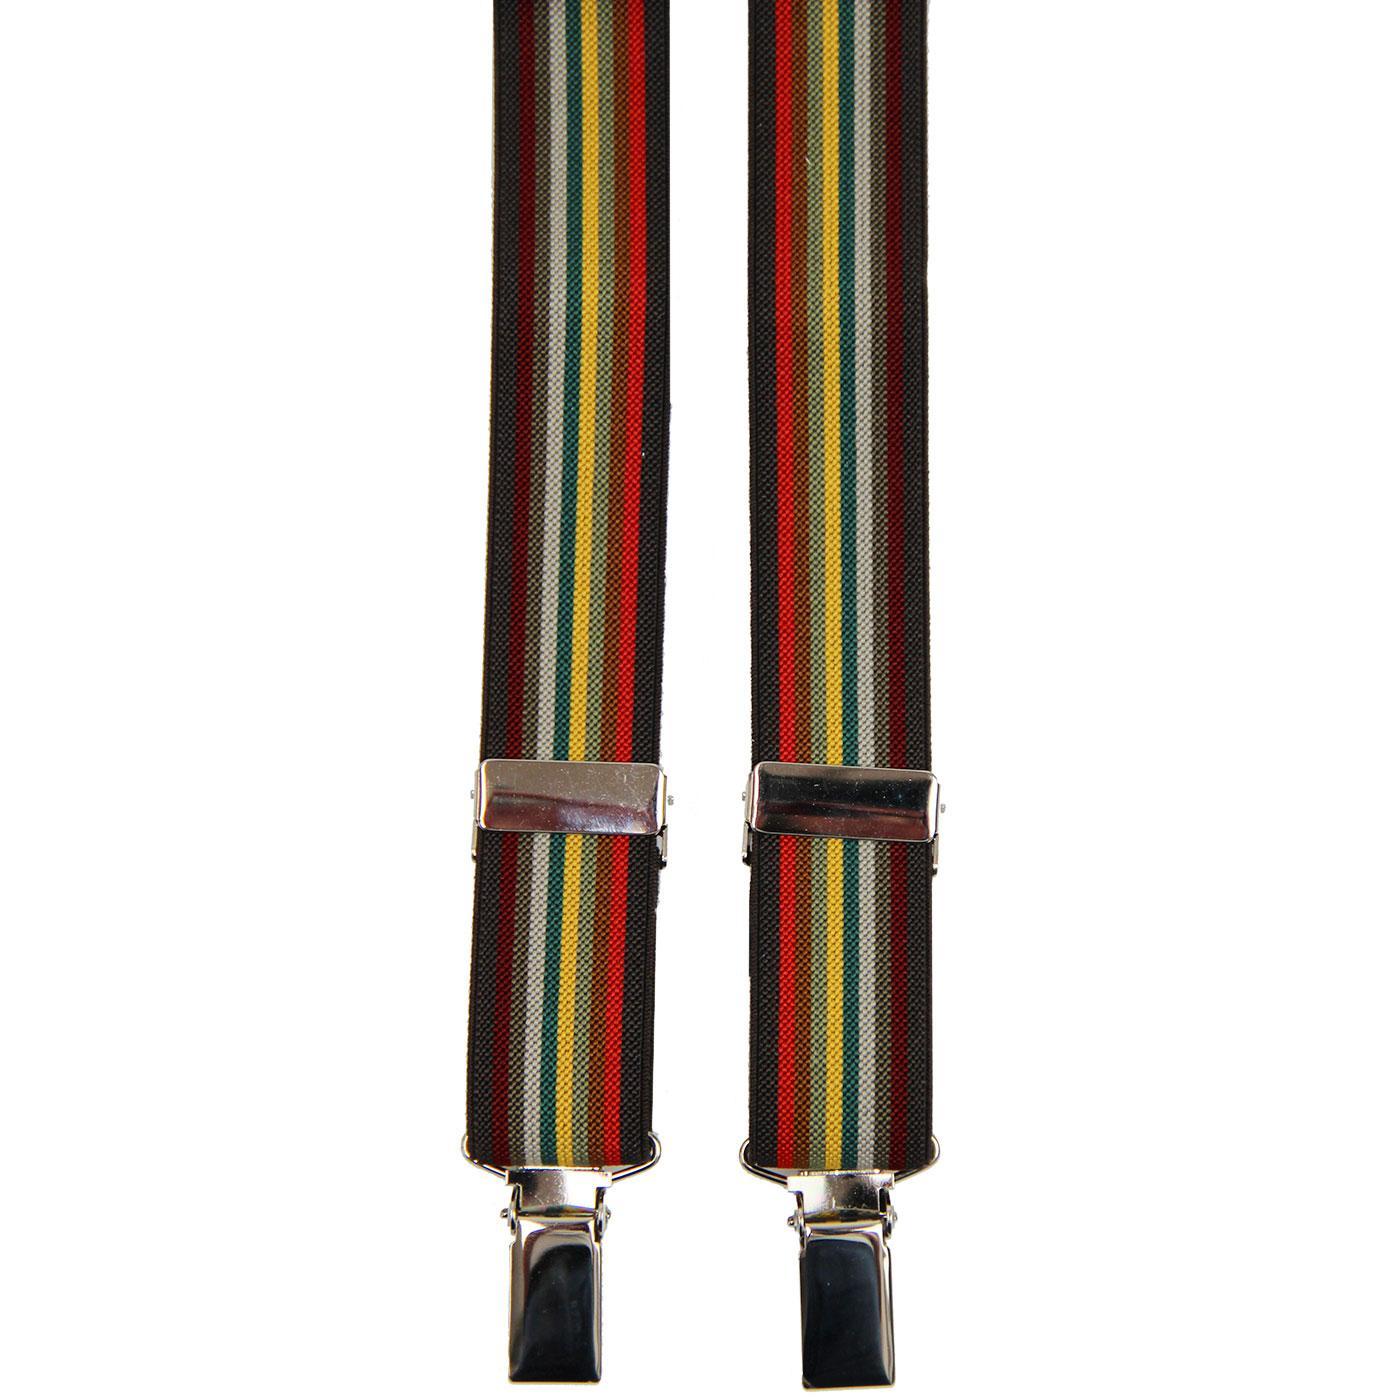 MADCAP ENGLAND Made in England Multi Stripe Braces